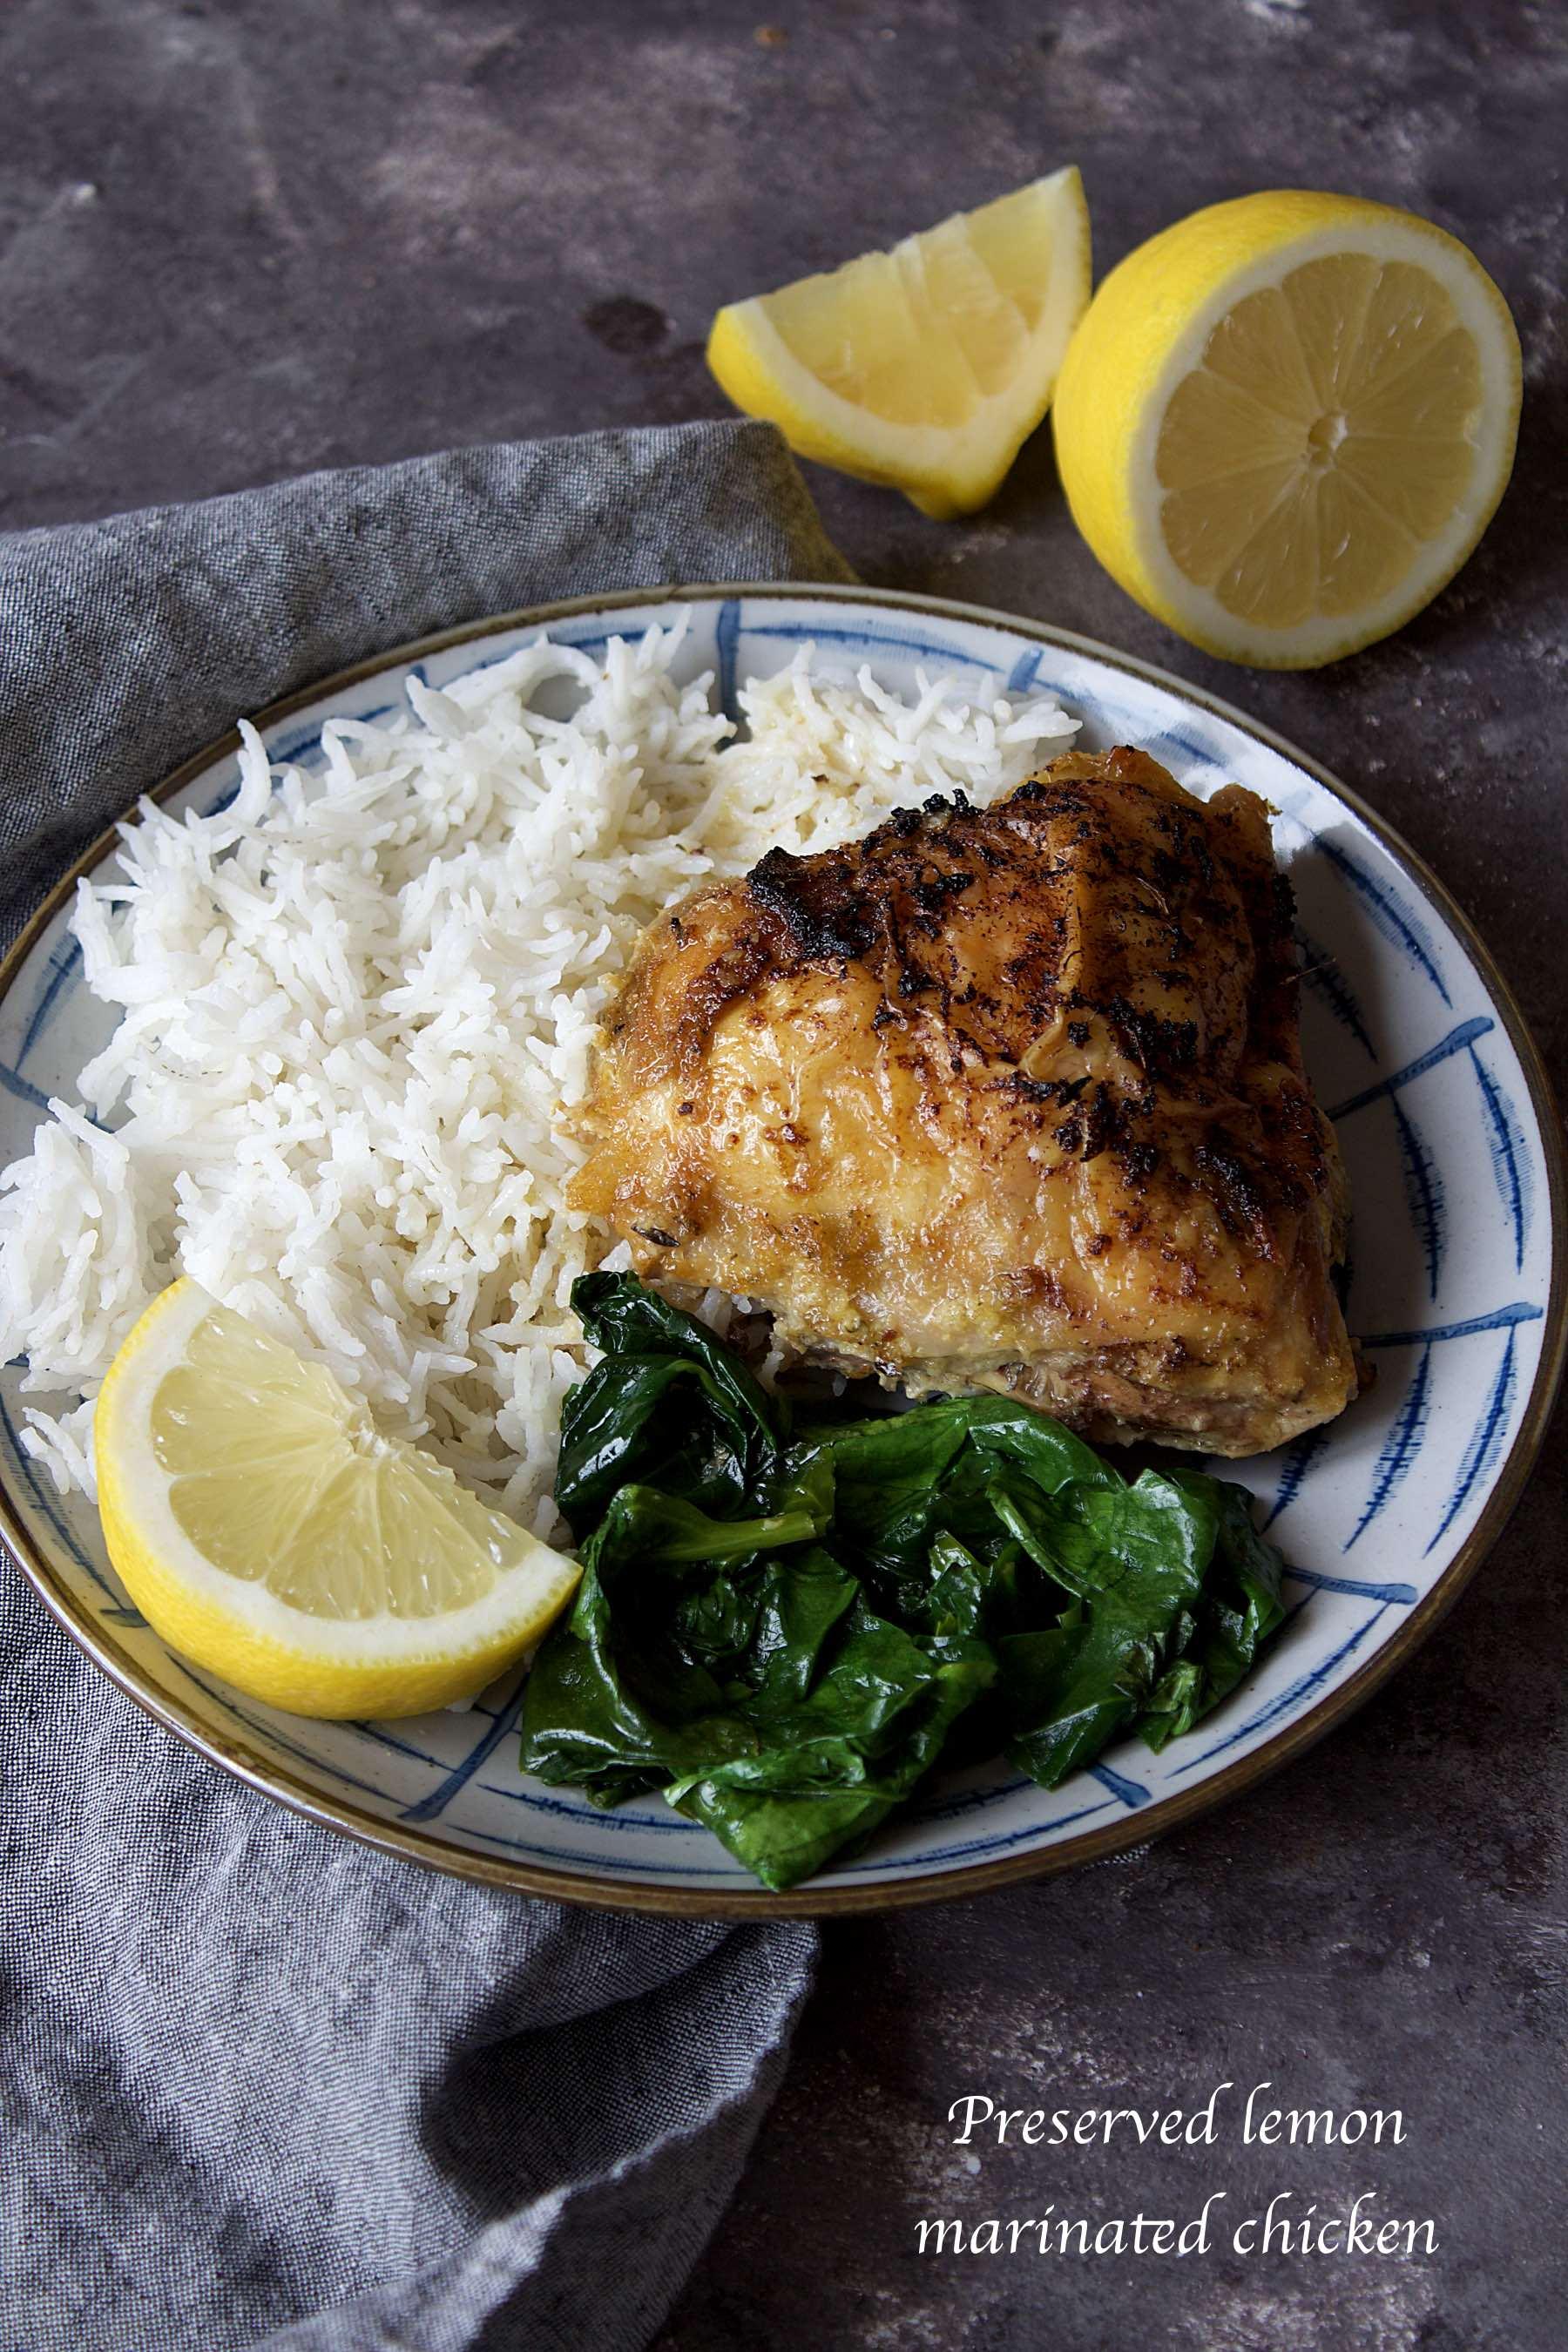 Preserved lemons marinated chicken